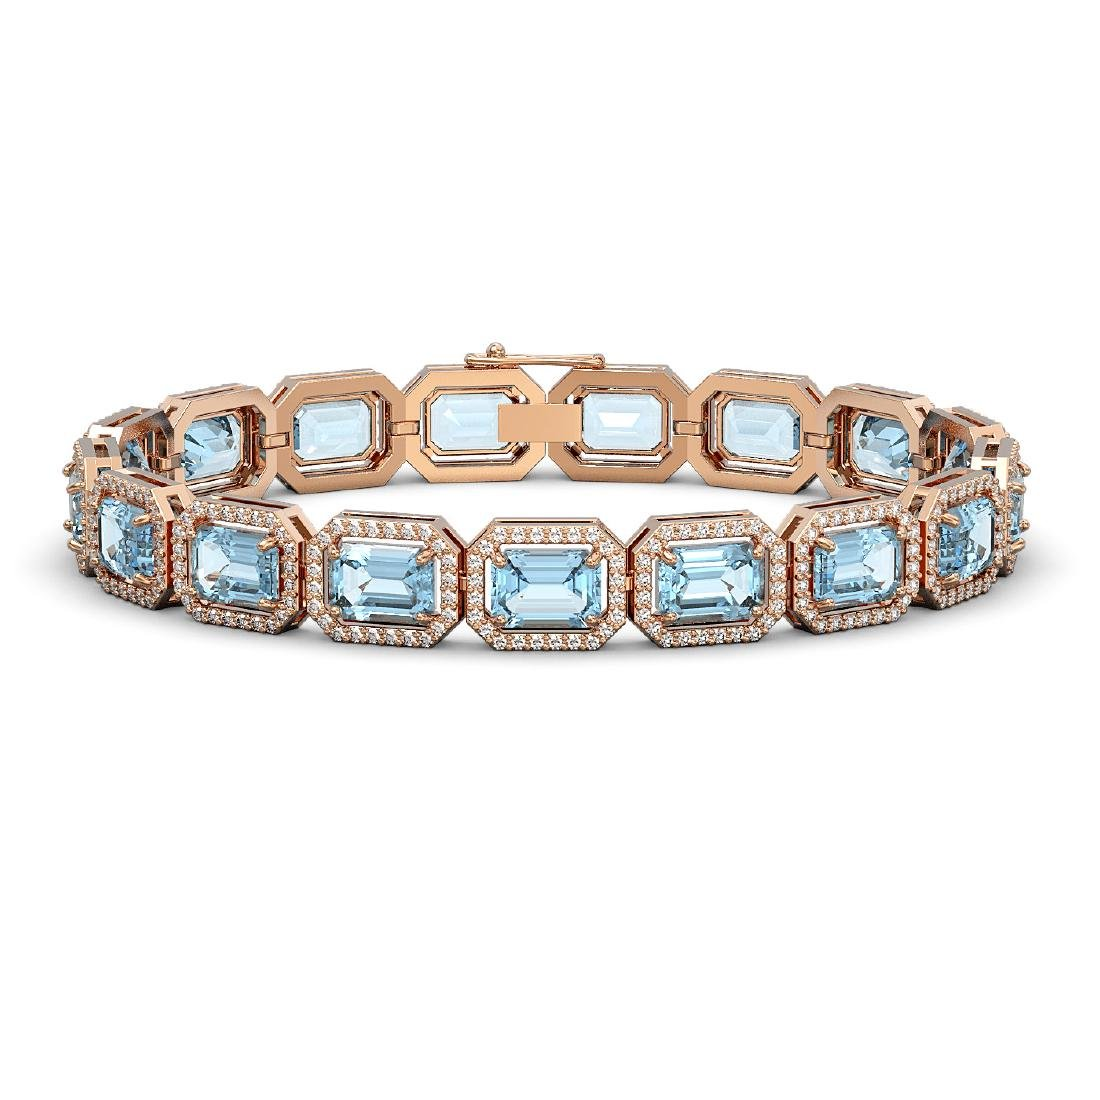 24.51 CTW Aquamarine & Diamond Halo Bracelet 10K Rose